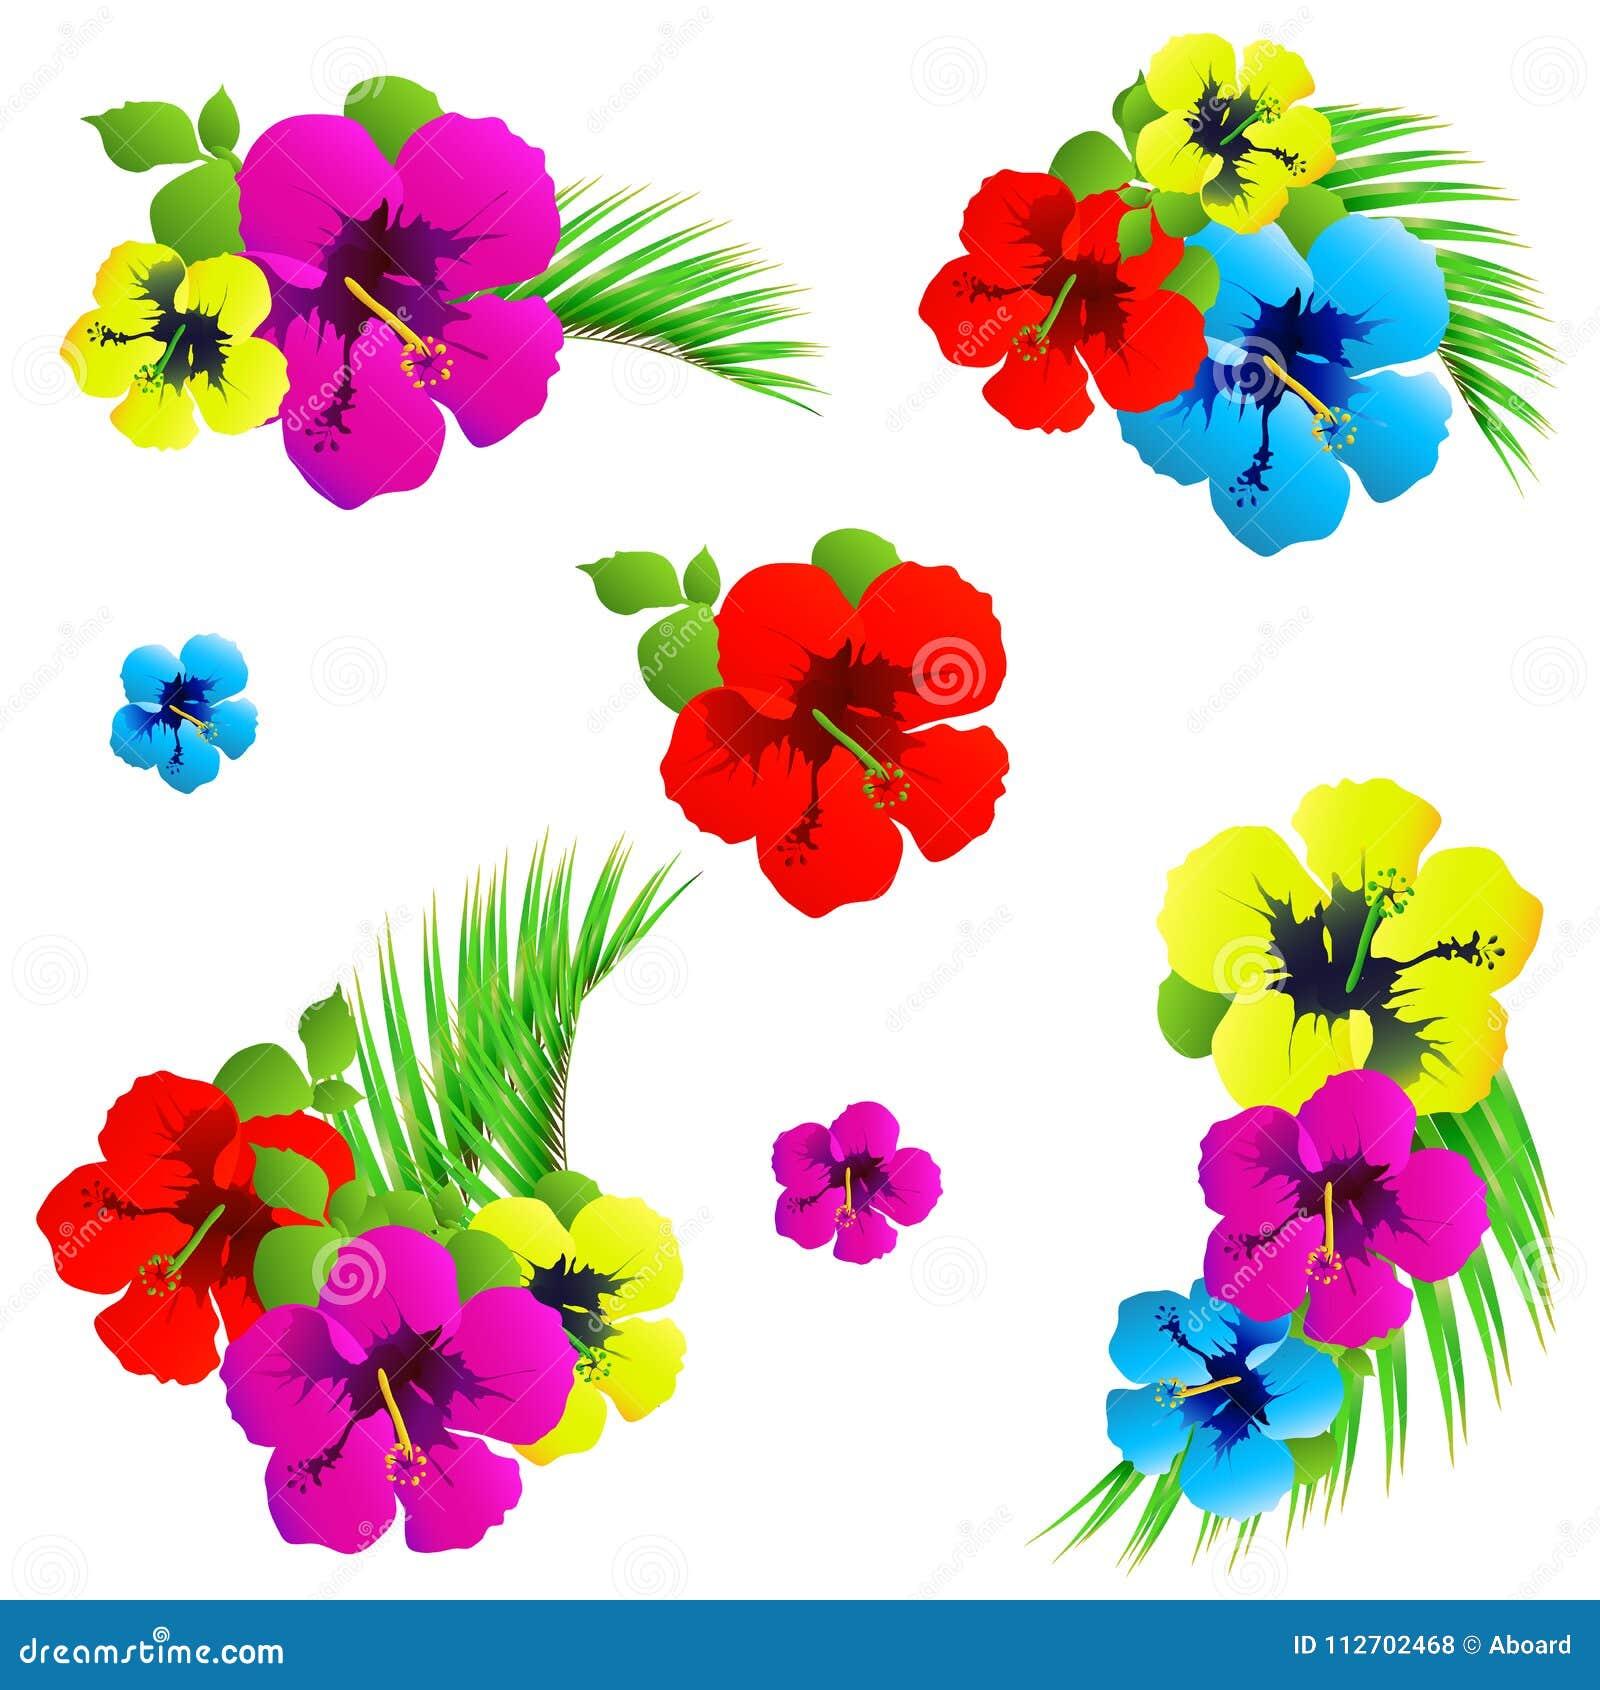 Hawaiian flowers exotic plants isolated on a white stock vector download hawaiian flowers exotic plants isolated on a white stock vector illustration of izmirmasajfo